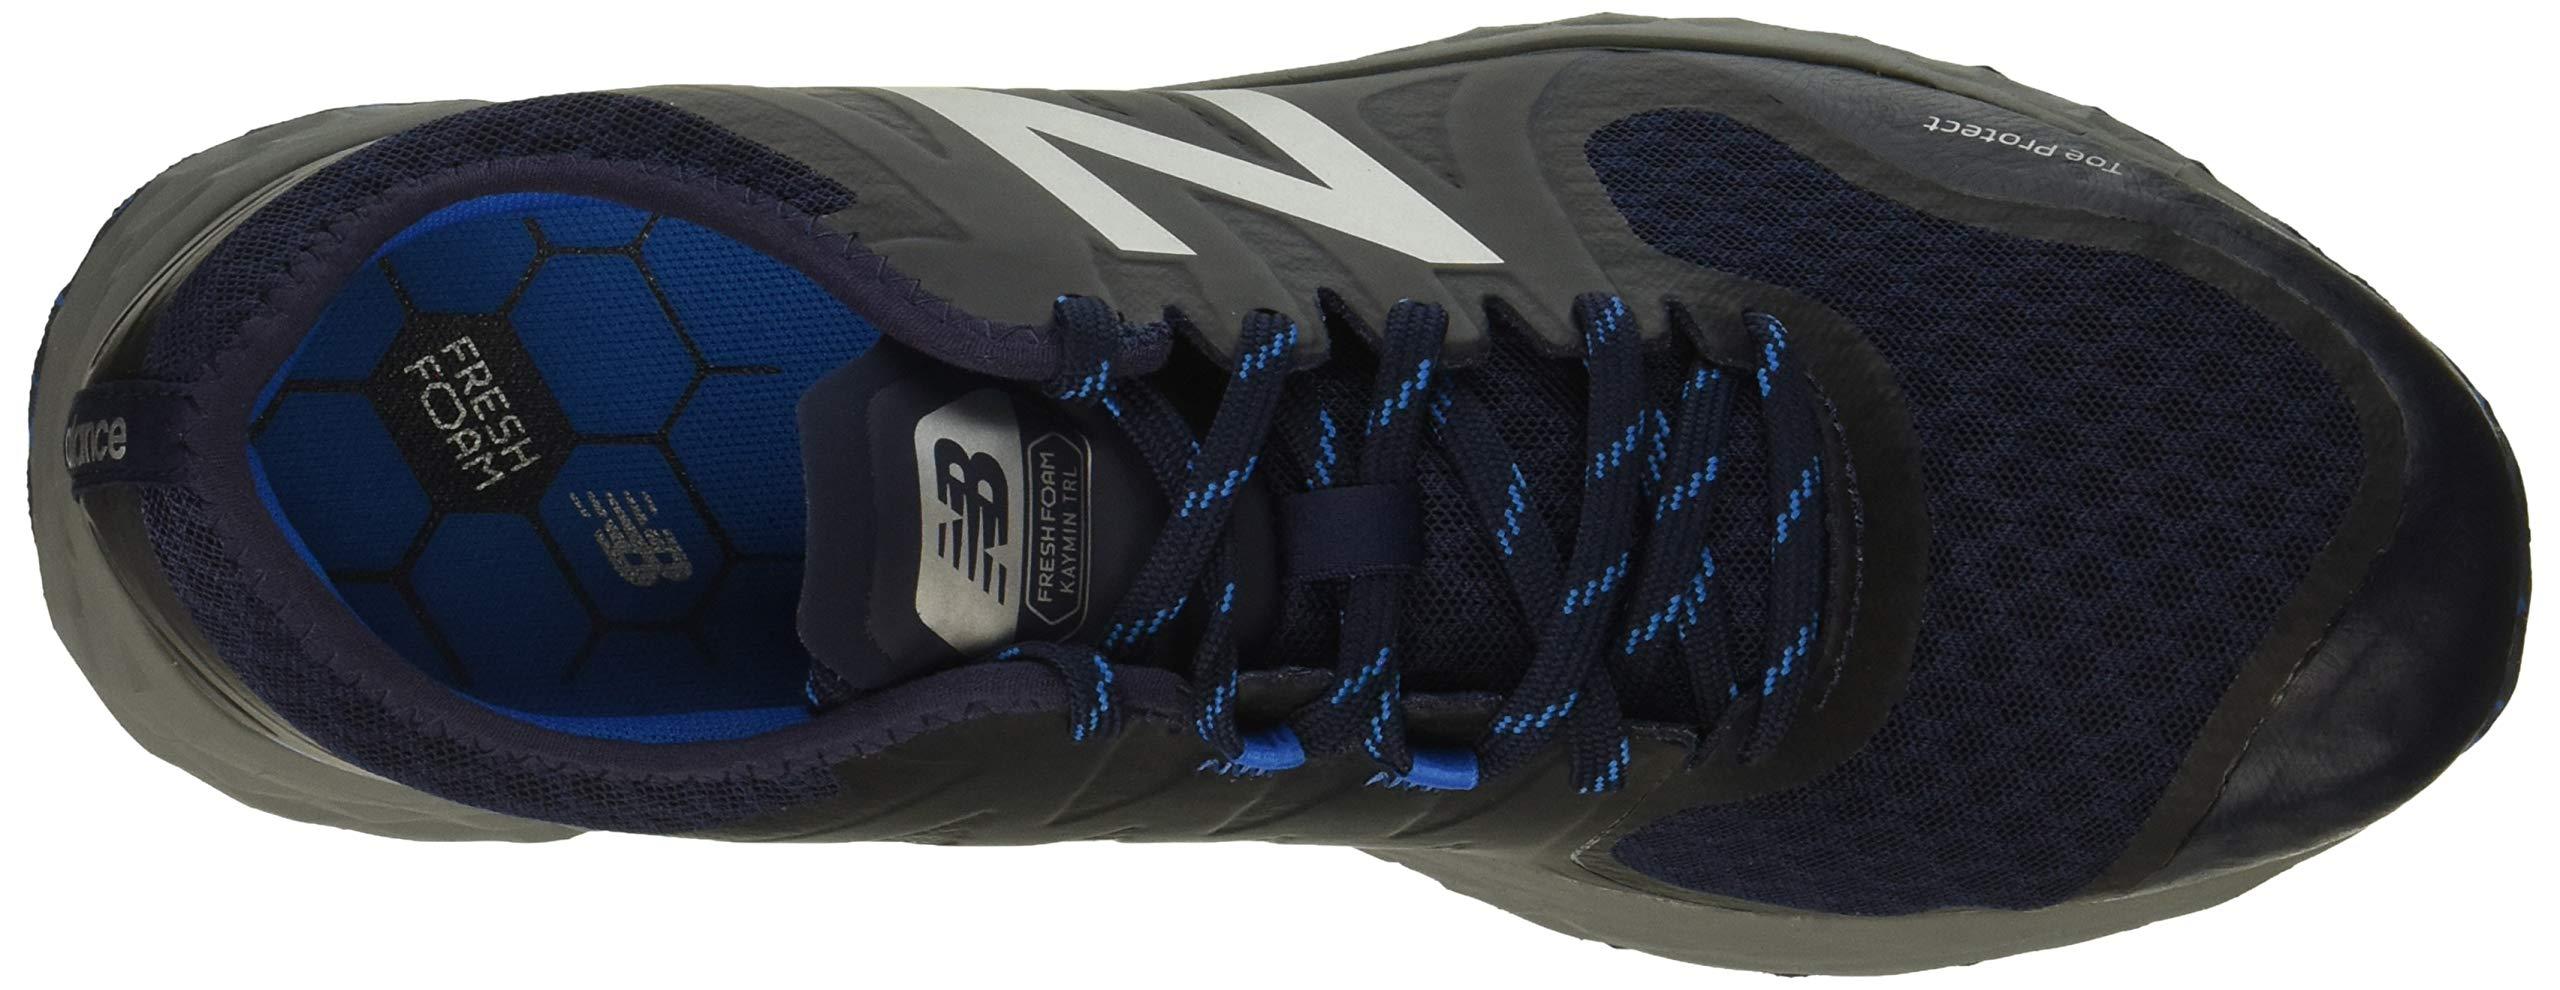 New Balance Men's Kaymin V1 Fresh Foam Trail Running Shoe Pigment/Laser Blue 1.5 D US by New Balance (Image #8)